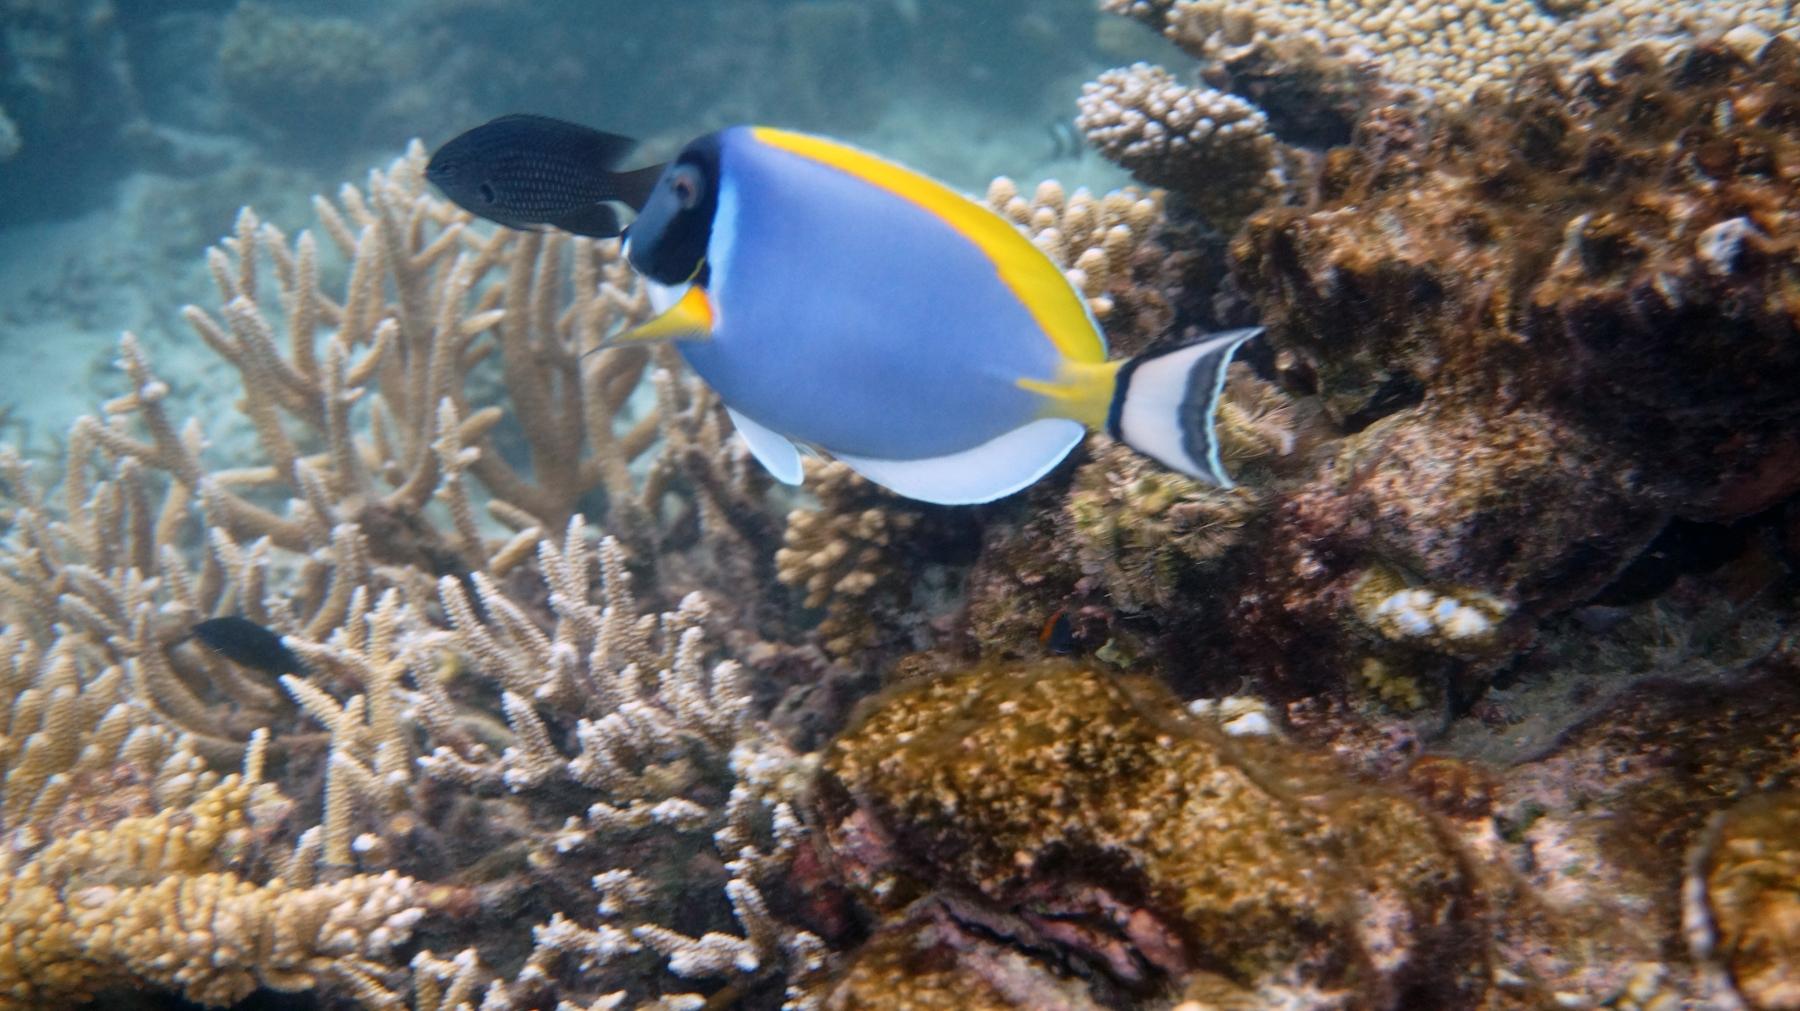 Acanthurus_leucosternon_002_C_Peces-Cirujano_L_Maldivas_U_Sebas_29062015